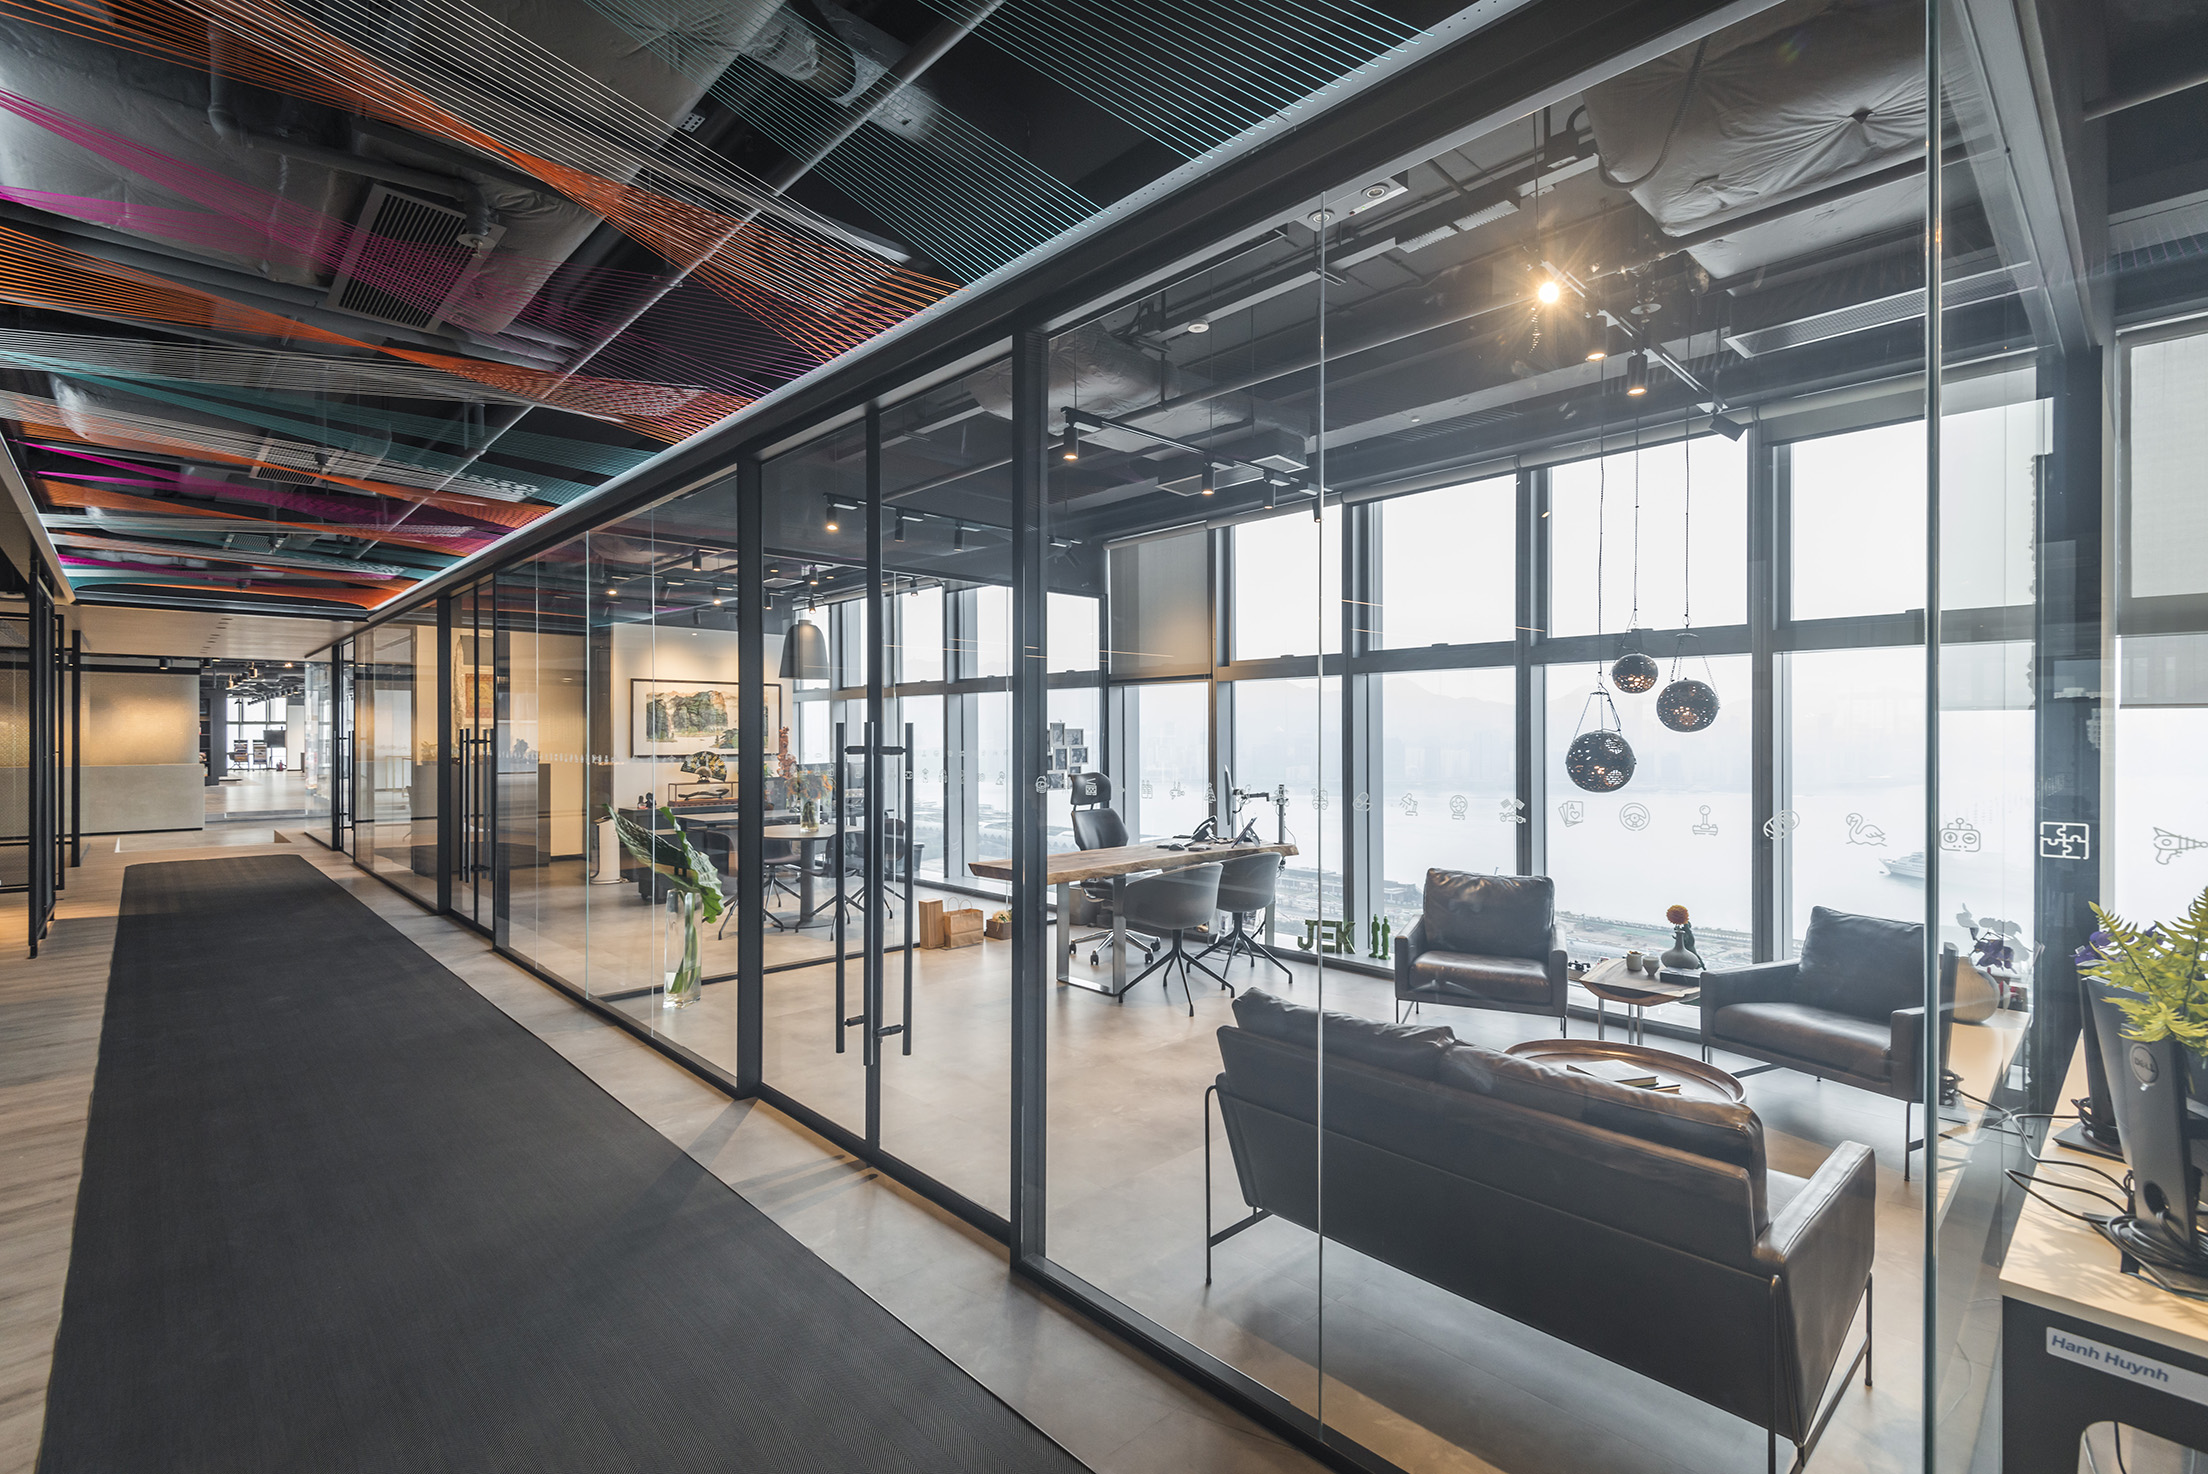 jeb-partitions-summit-threesixty-office-hk-07.jpg